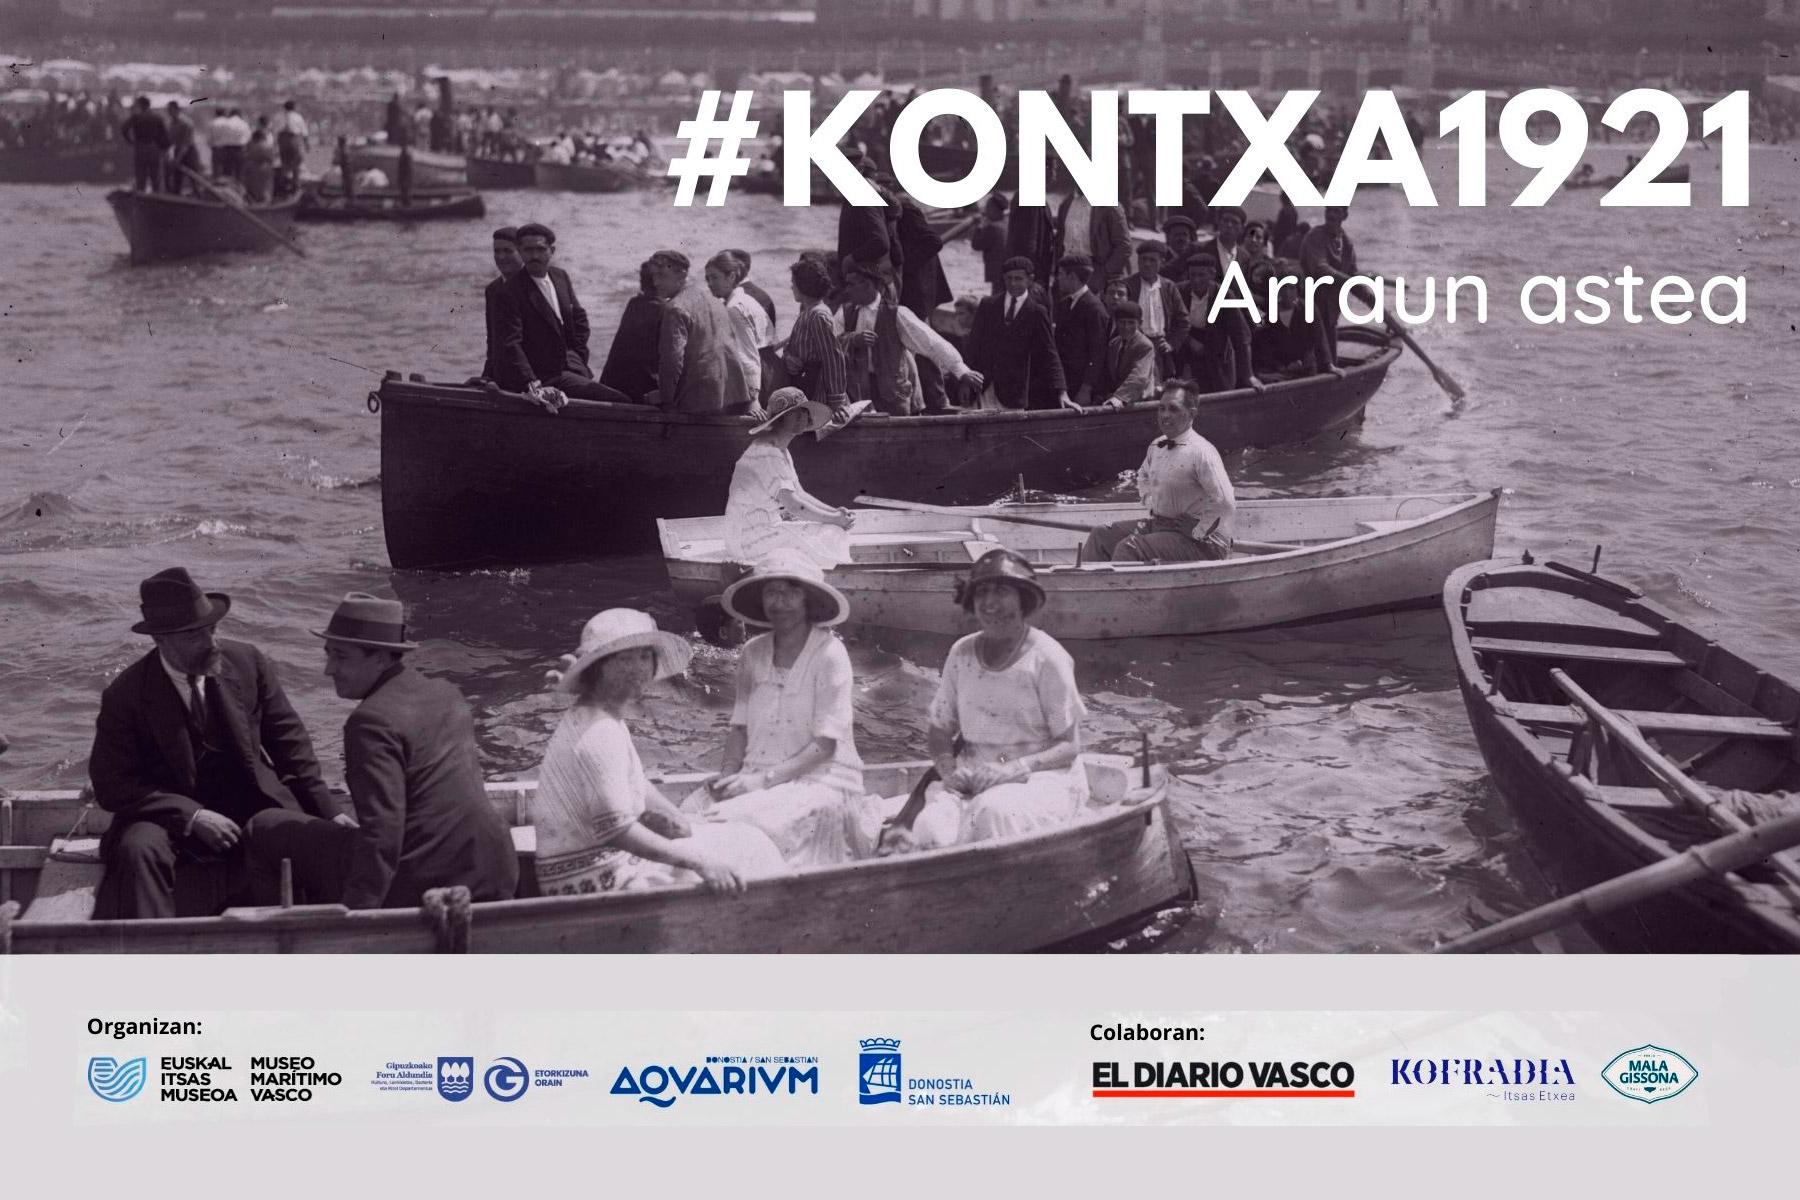 Arraun astea - Euskal Itsas Museoa - Bertso saioa